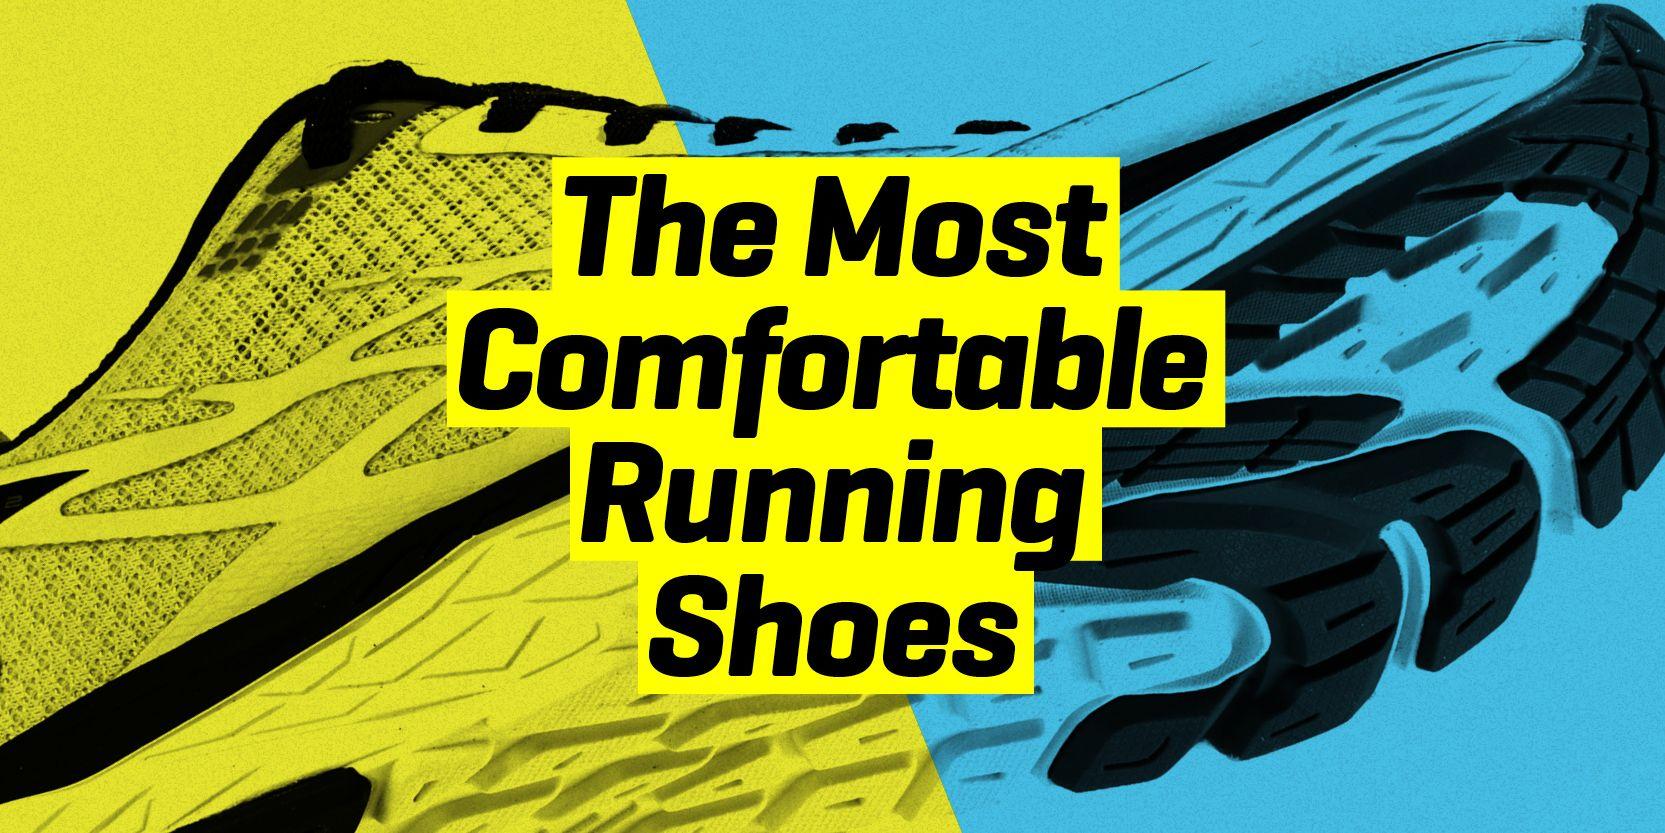 Comfortable Shoes Shoes